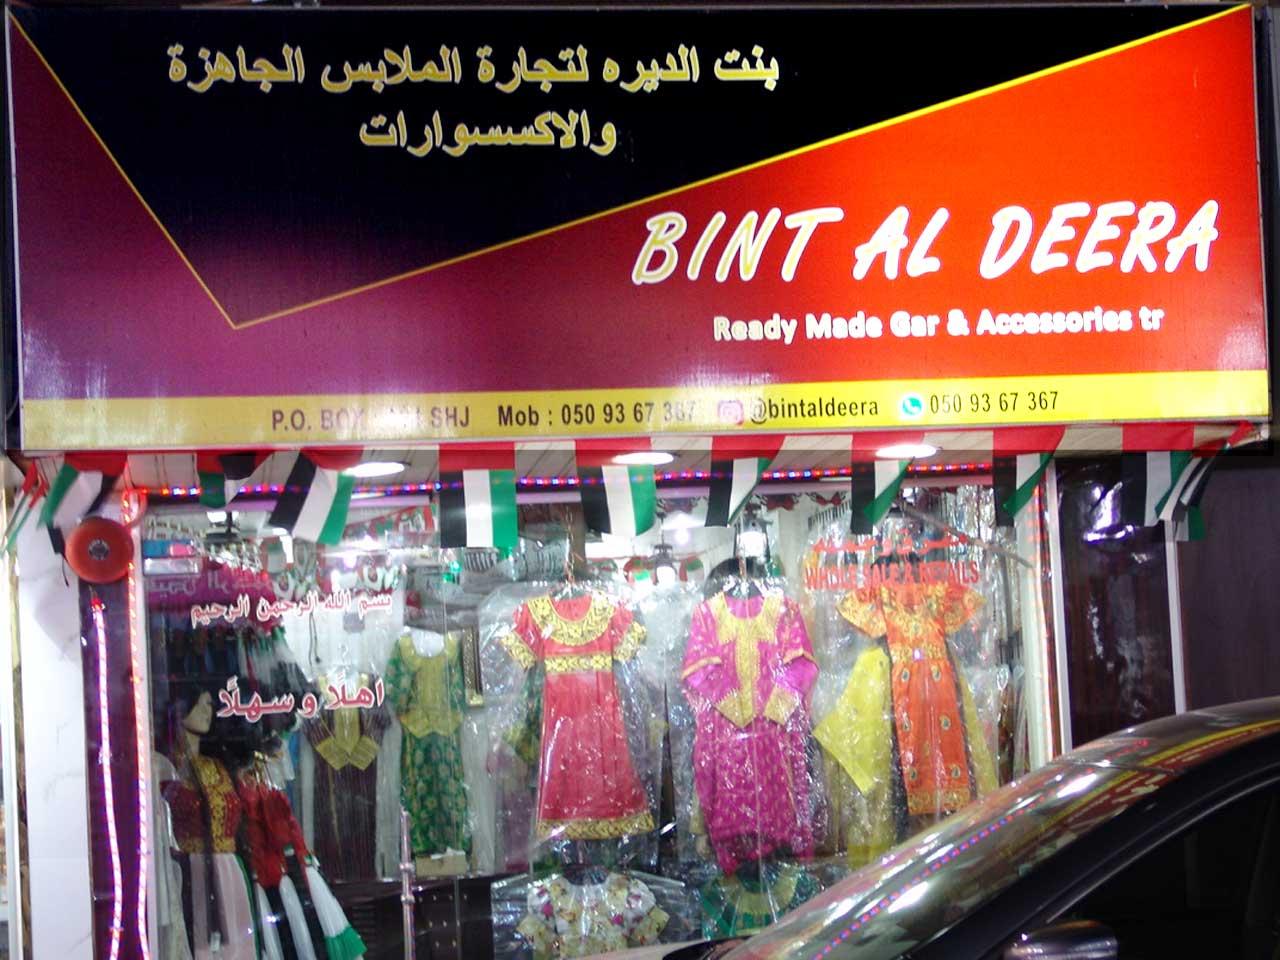 Bint Al Deera Ready made Garments - 1.jpg